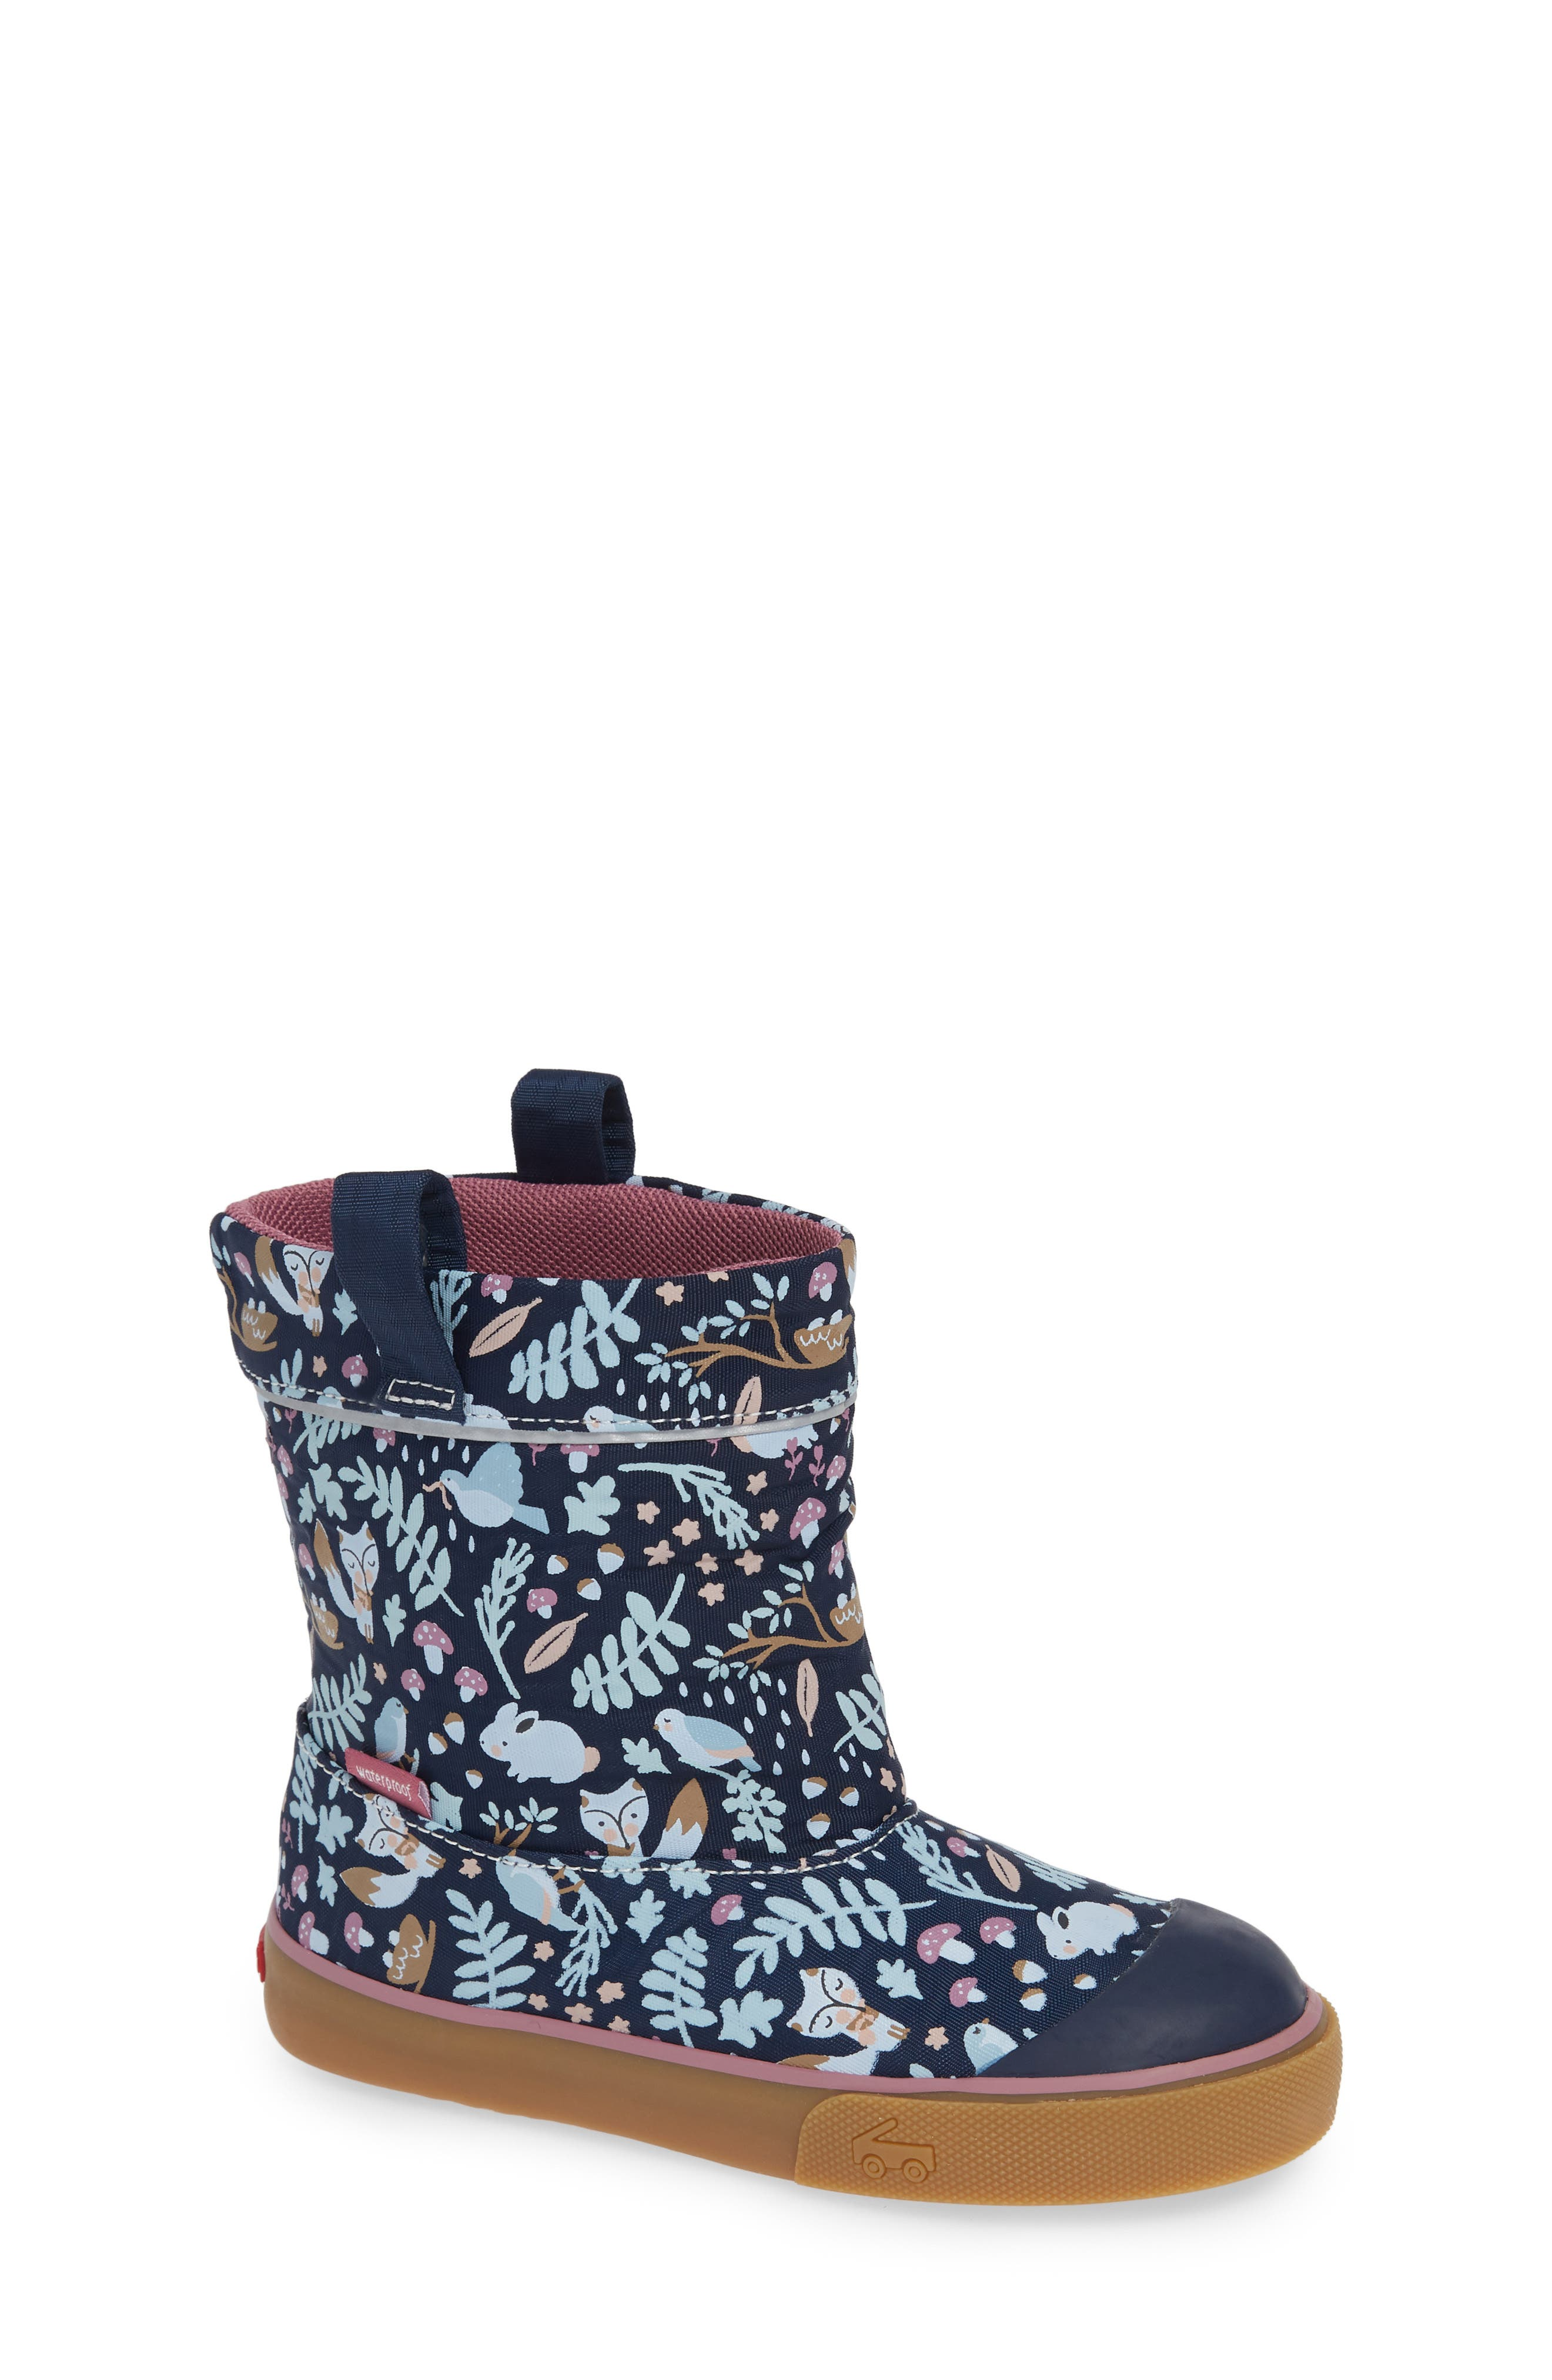 Montlake Waterproof Boot,                         Main,                         color, NAVY WOODLAND